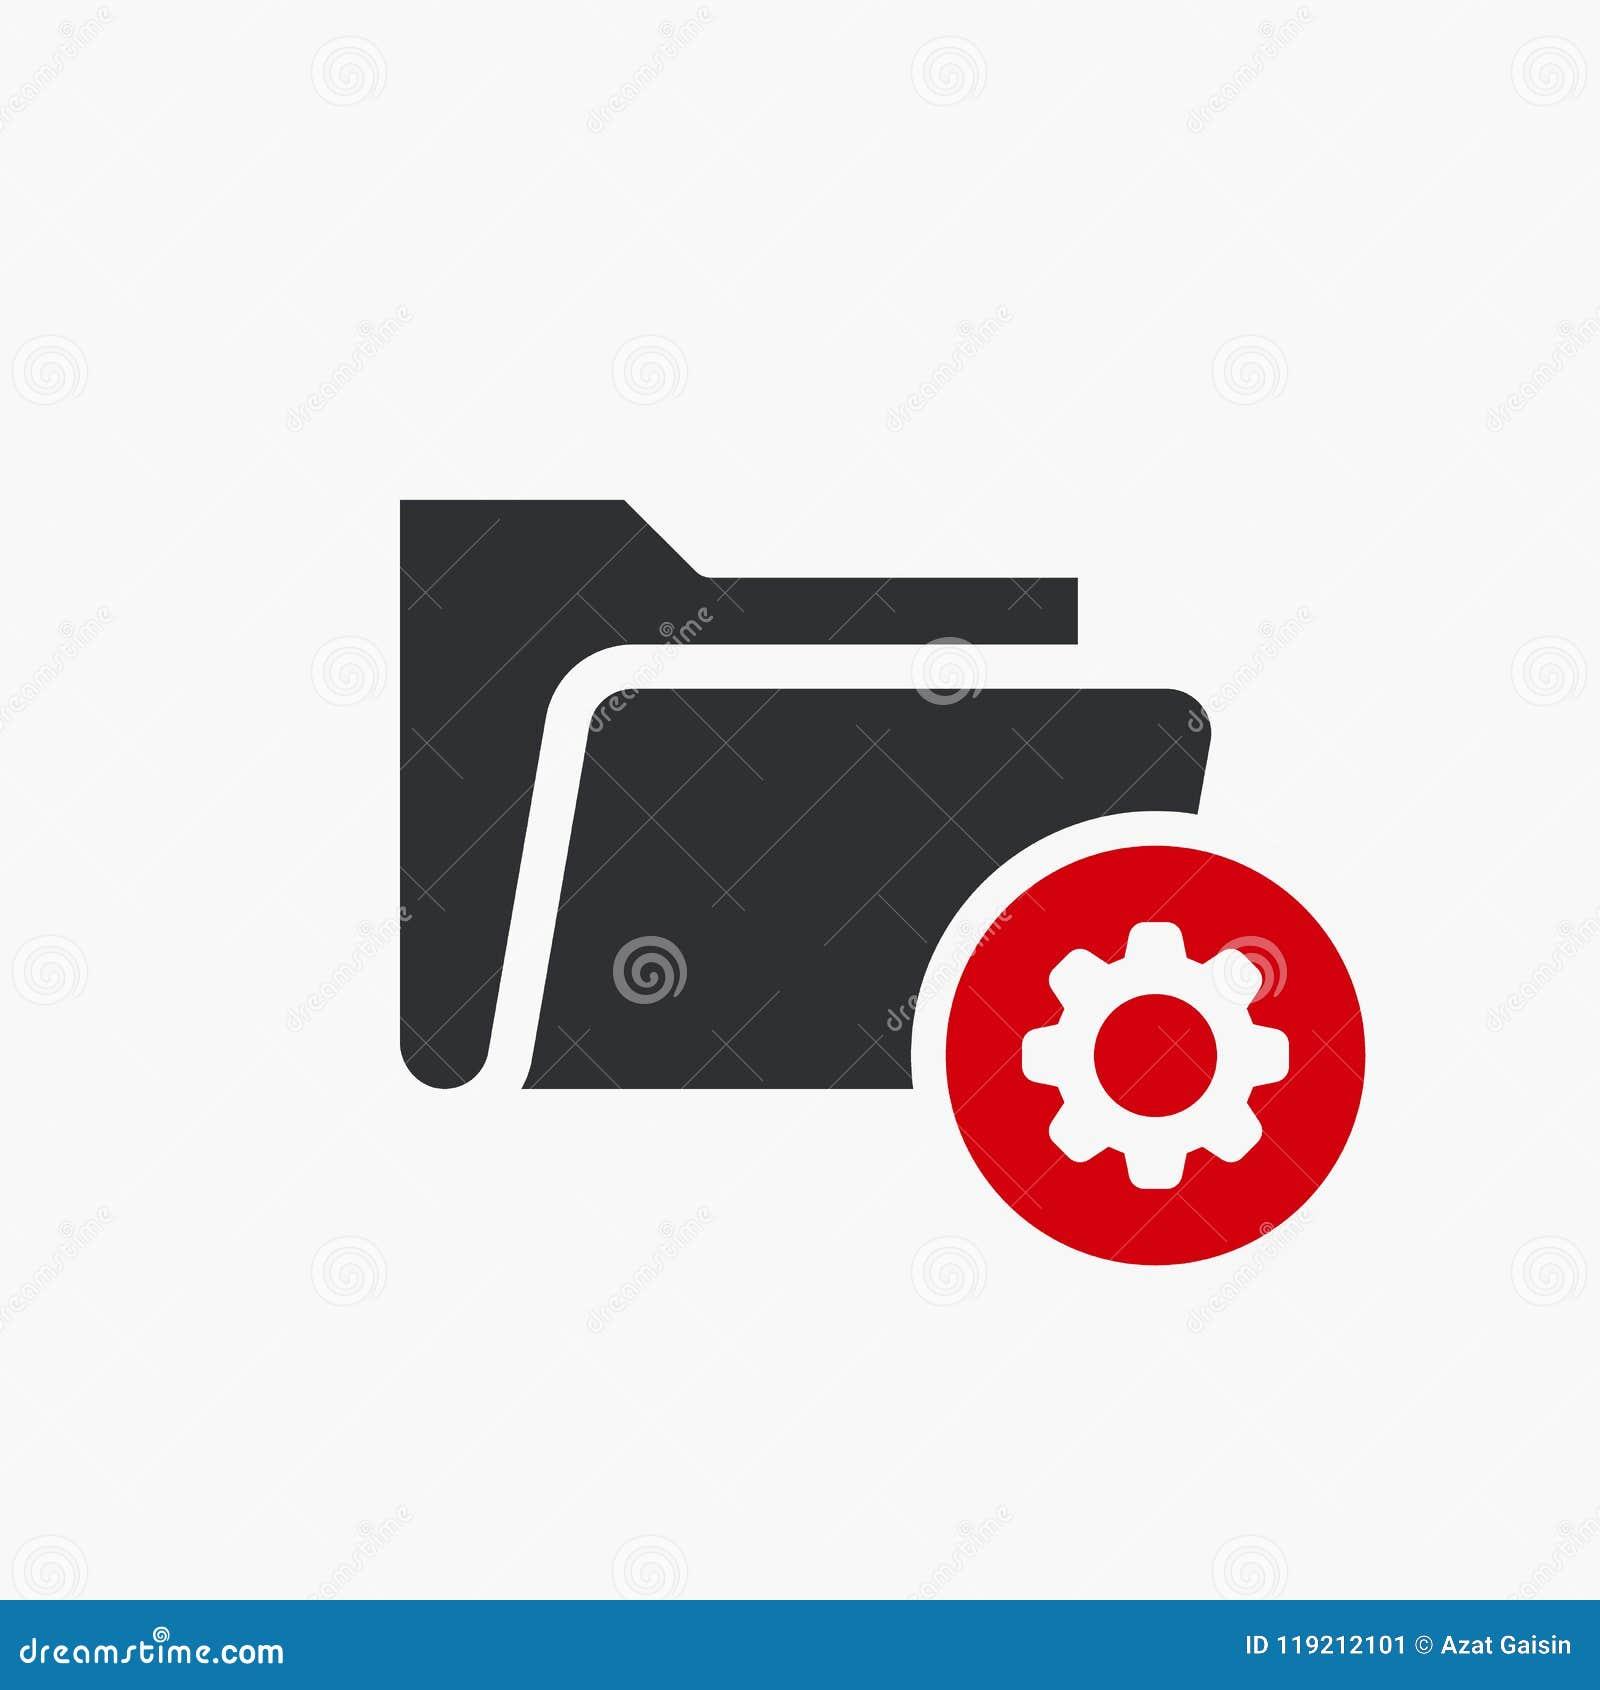 Windows] how to change folder icon to custom icon on windows 10.